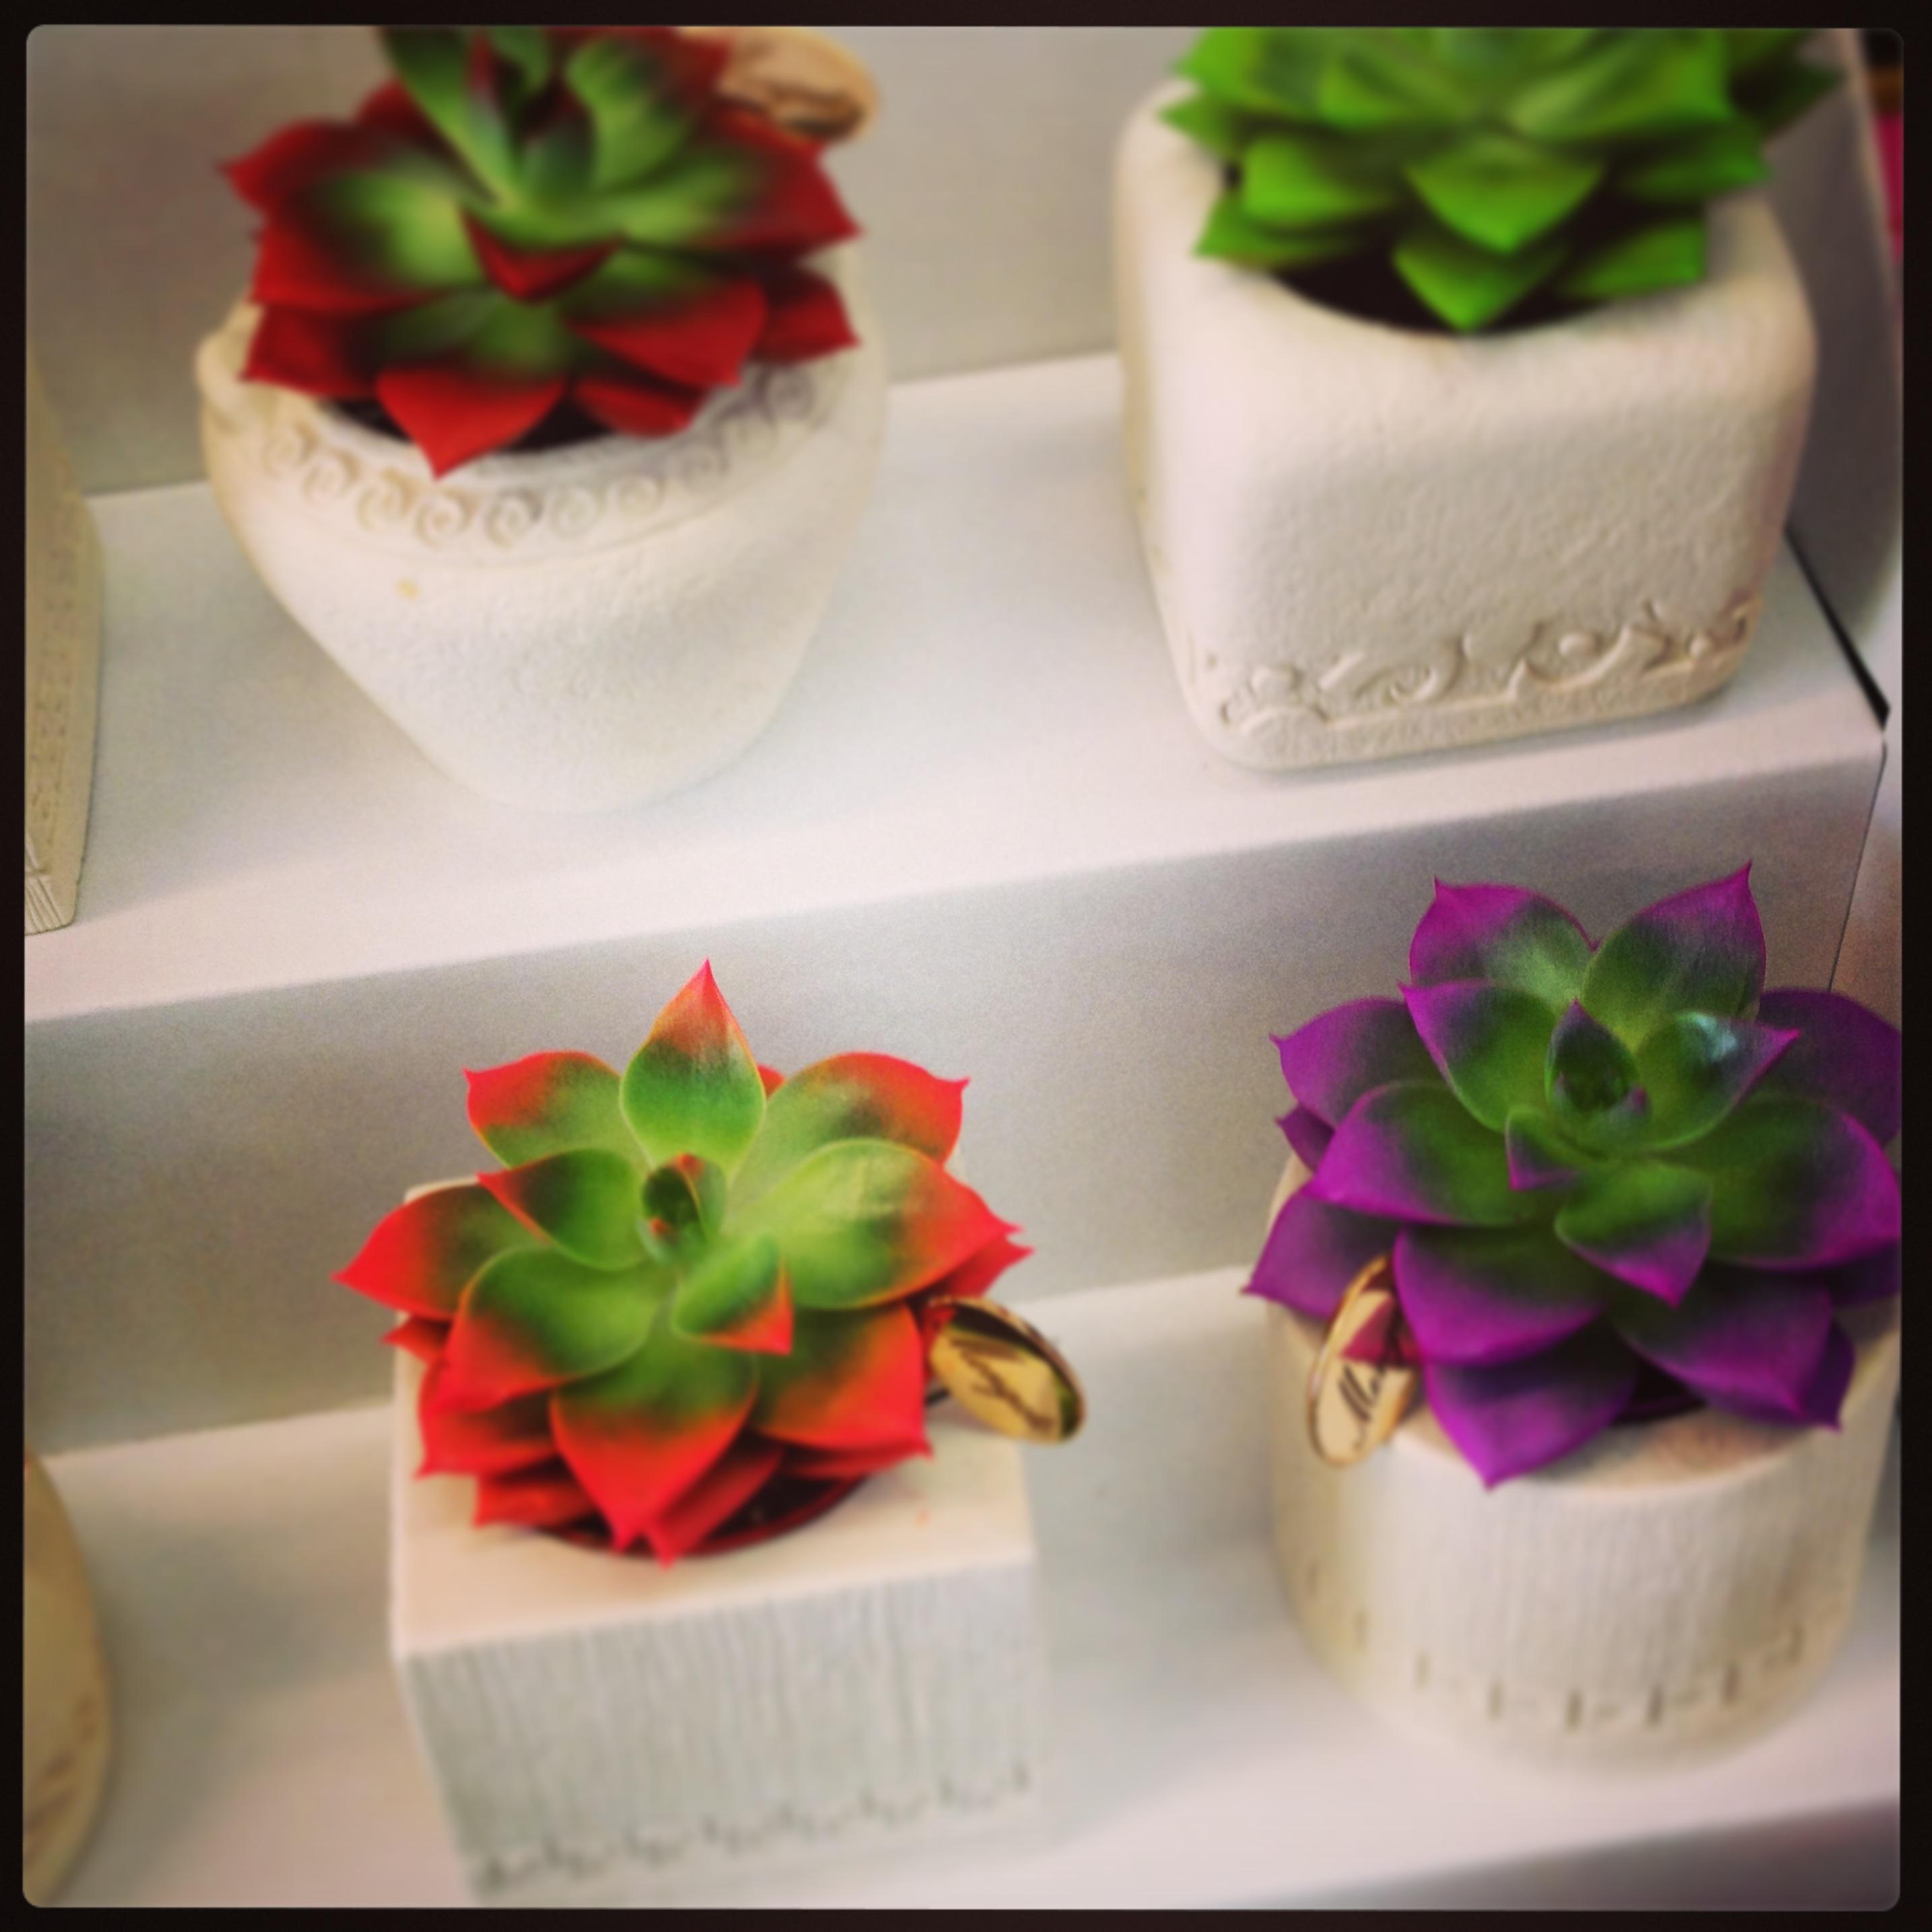 Vasi per piante grasse portfolio archivi lithos color - Piante per ufficio ...